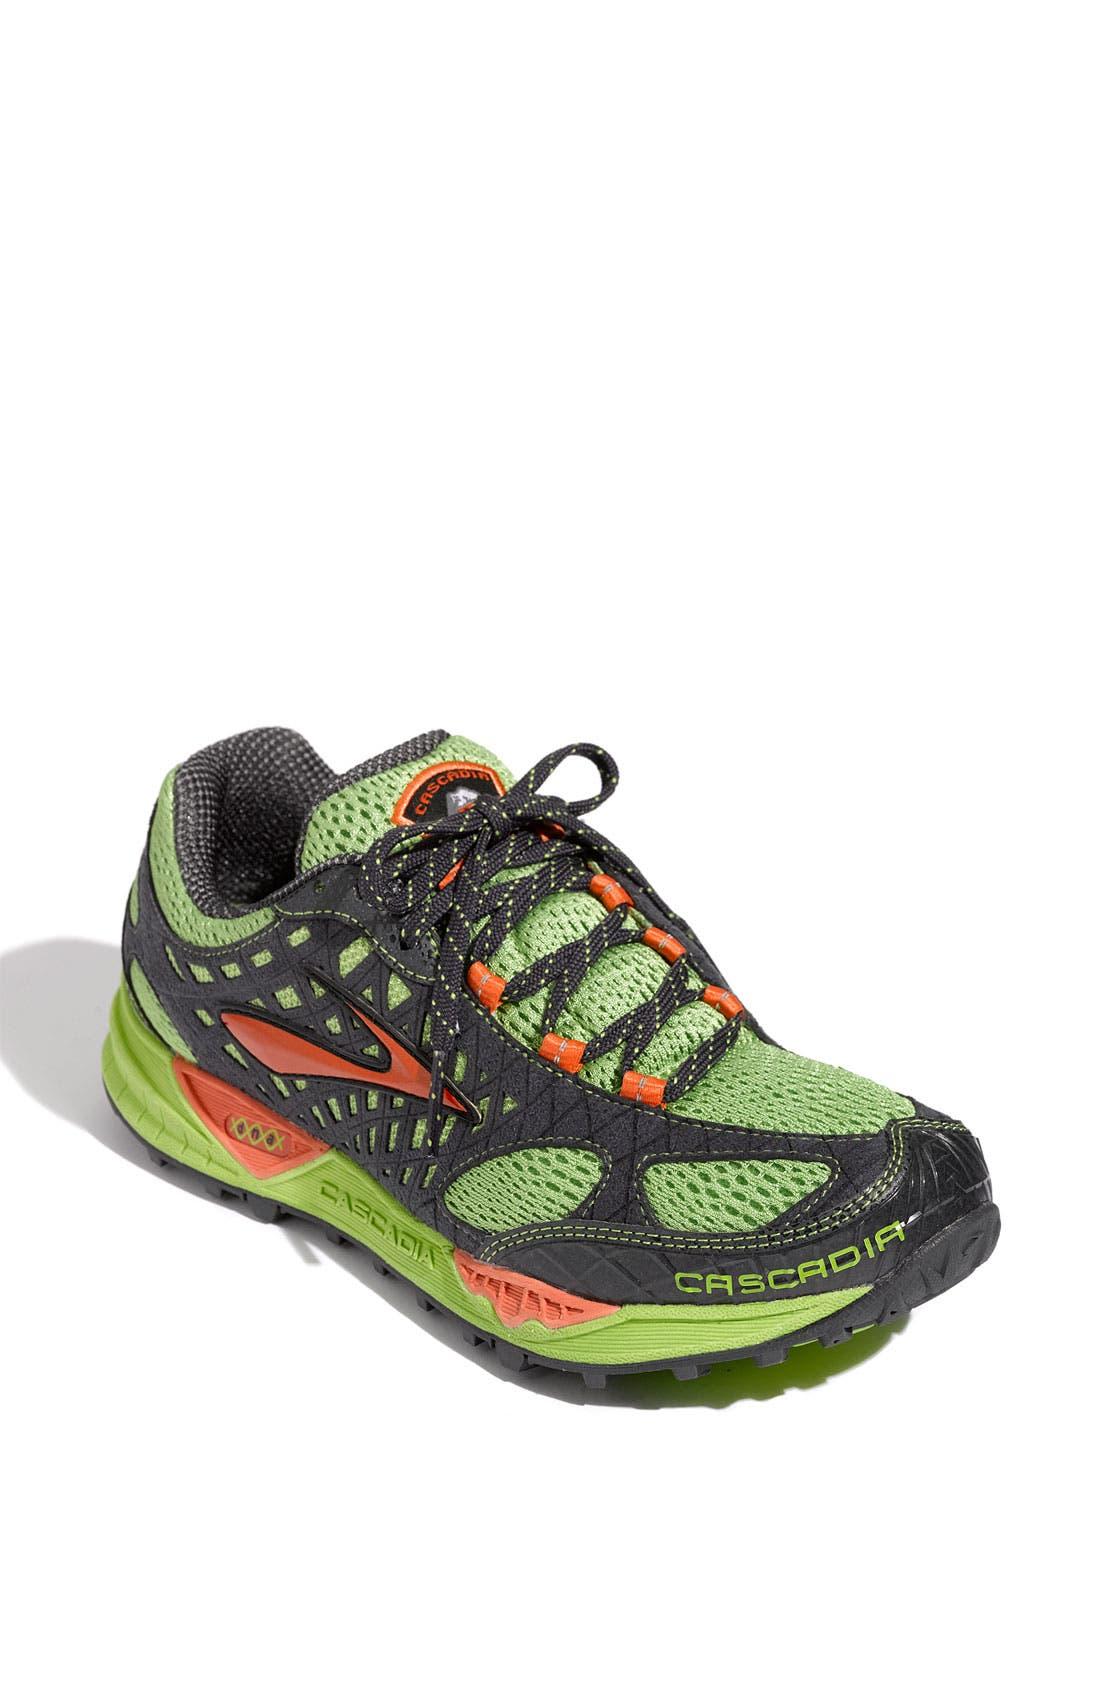 Alternate Image 1 Selected - Brooks 'Cascadia 7' Running Shoe (Women)